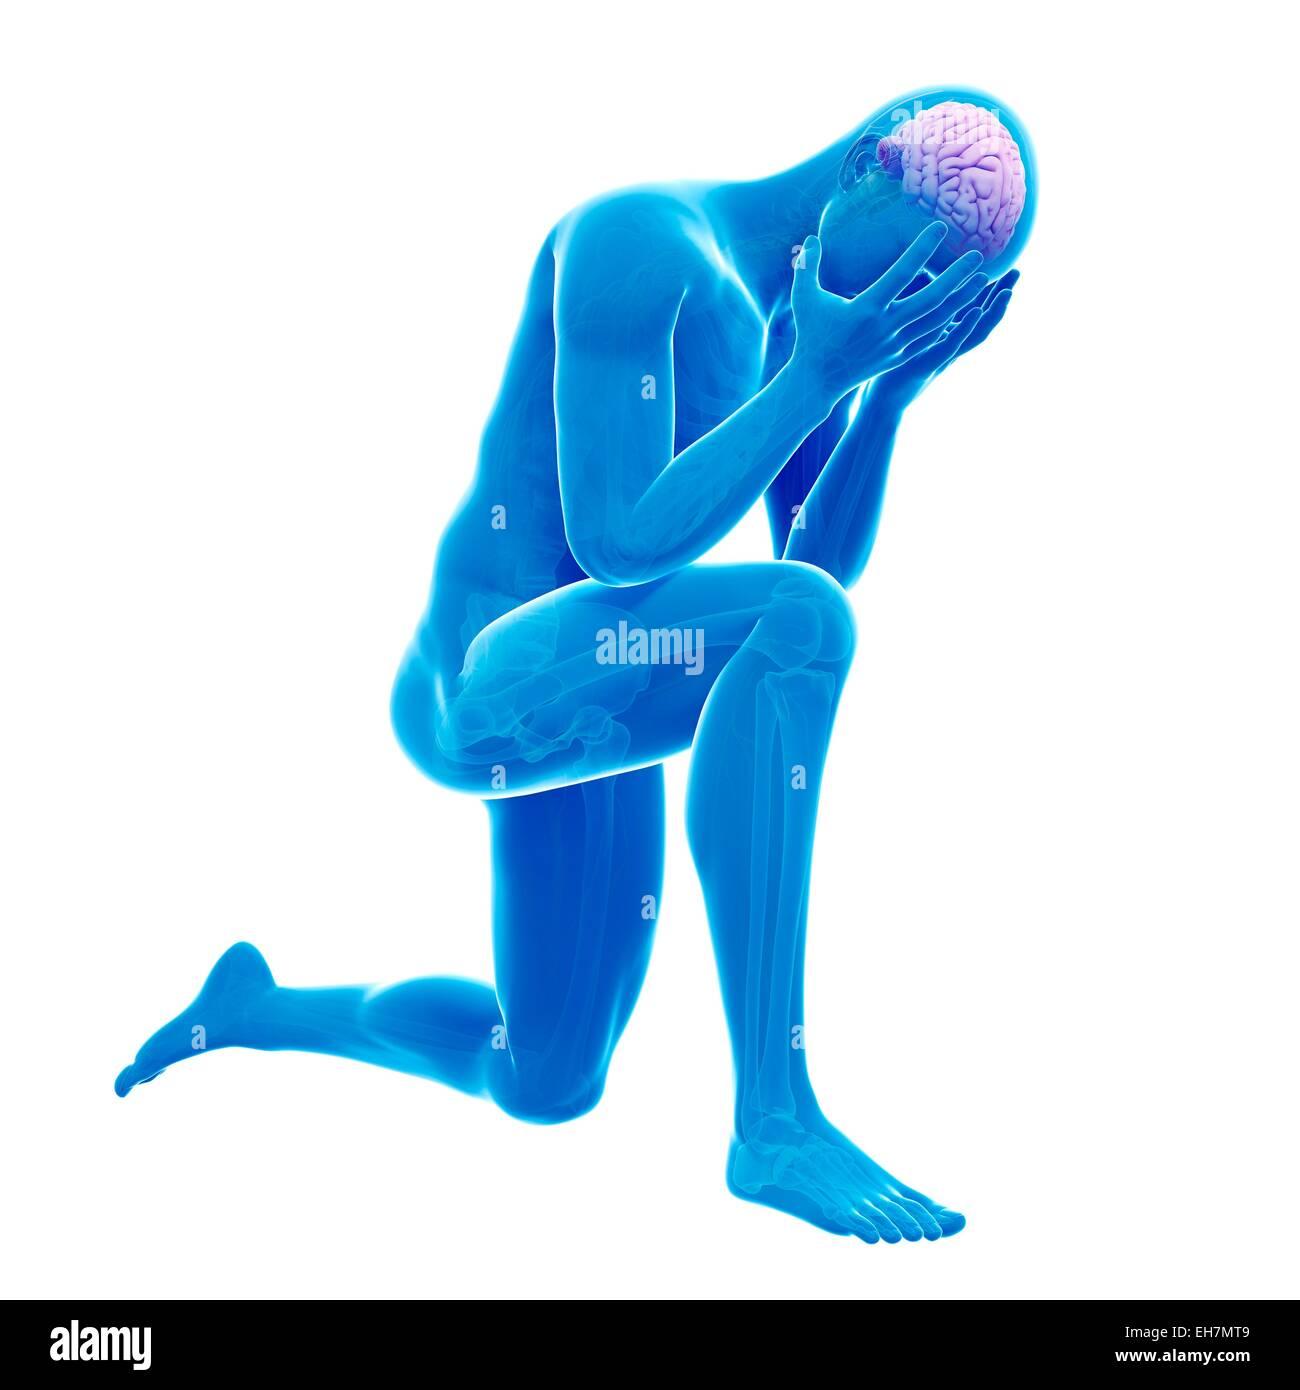 Human brain, illustration - Stock Image